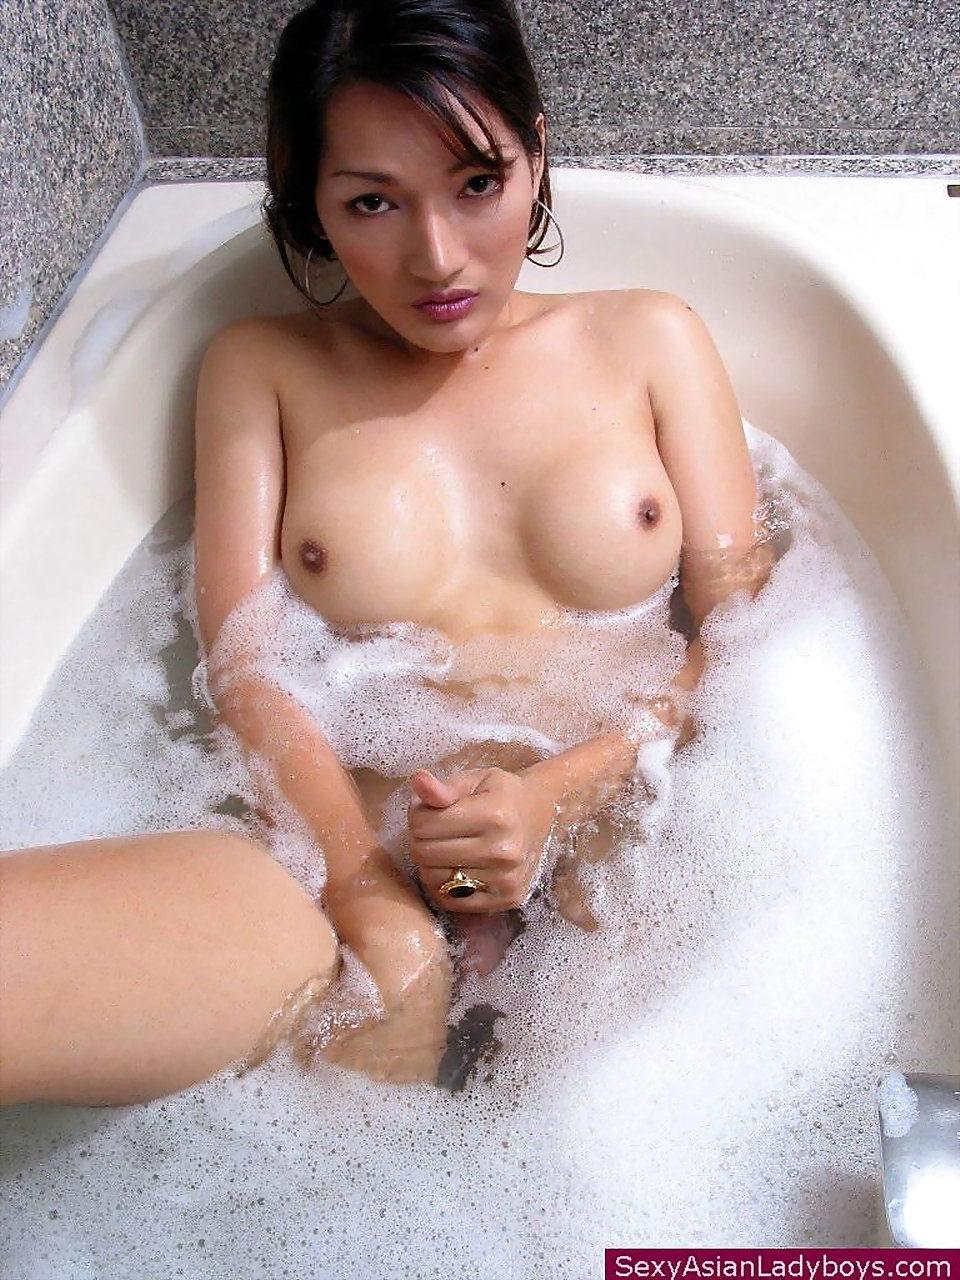 Busty Trannie Jerking Her Rough Rock Hardon While Taking A Foam Bath